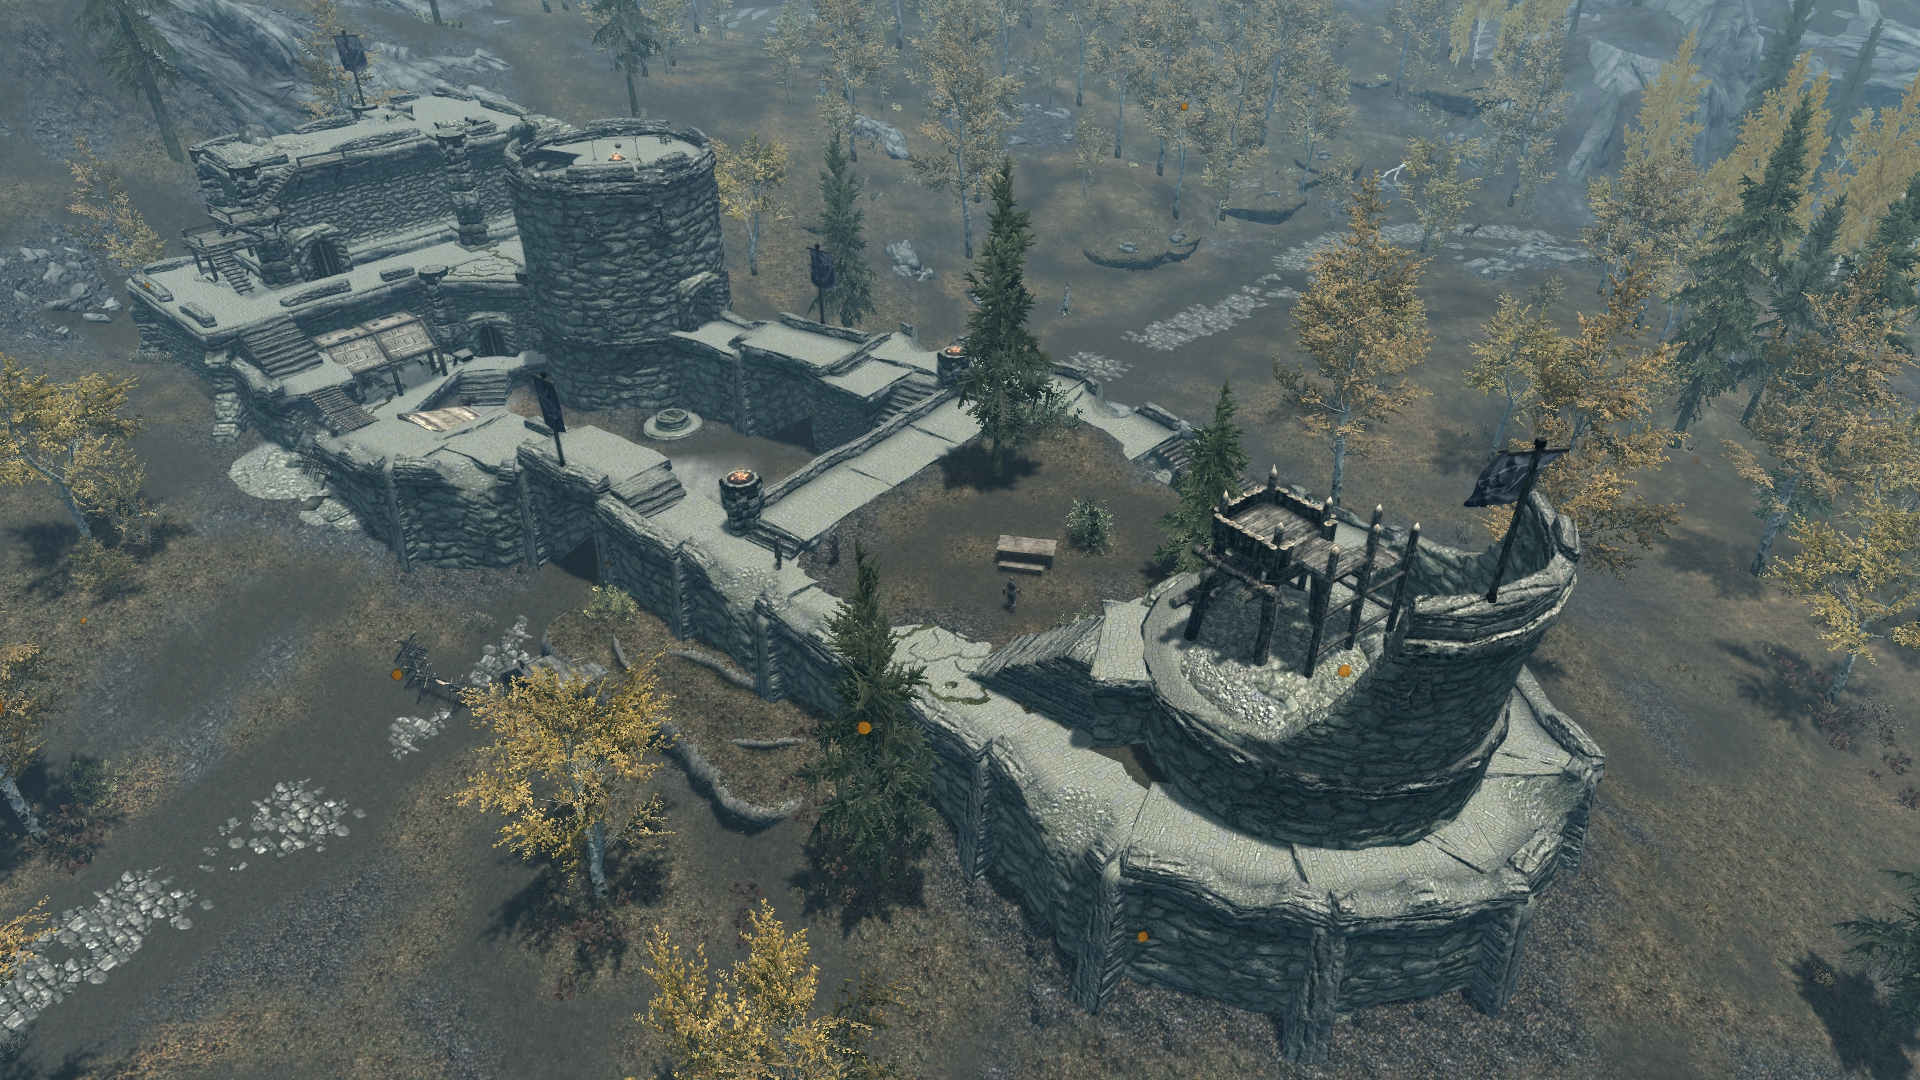 Битва за форт Гринвол (Братья Бури)